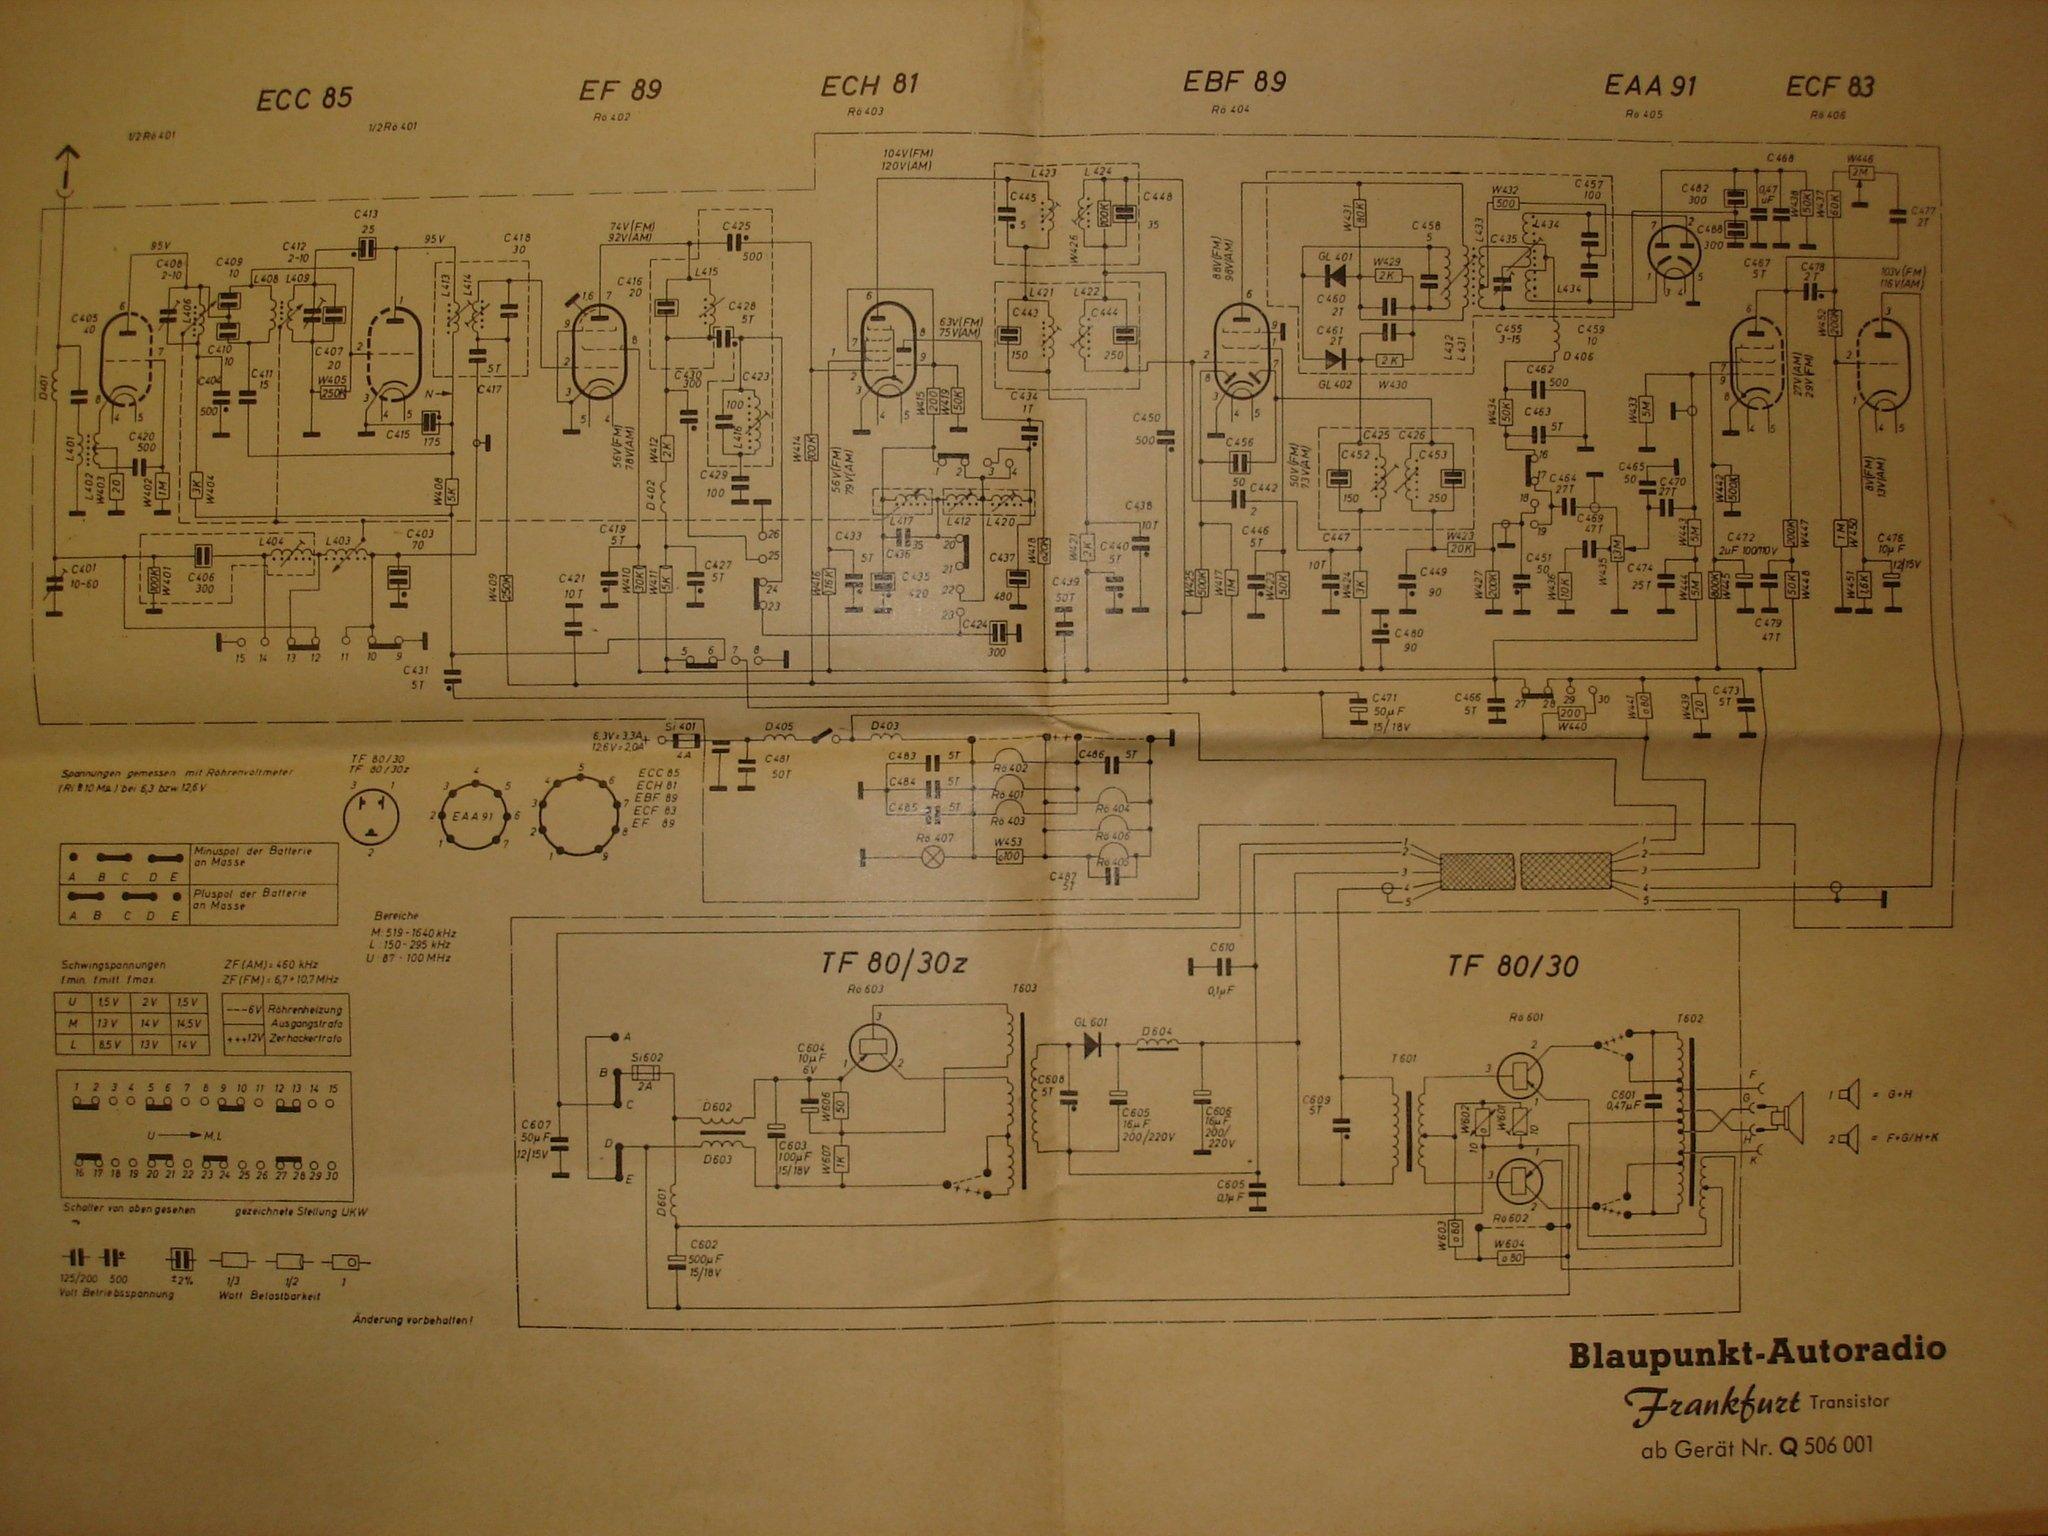 1959 60 blaupunkt frankfurt radio. Black Bedroom Furniture Sets. Home Design Ideas